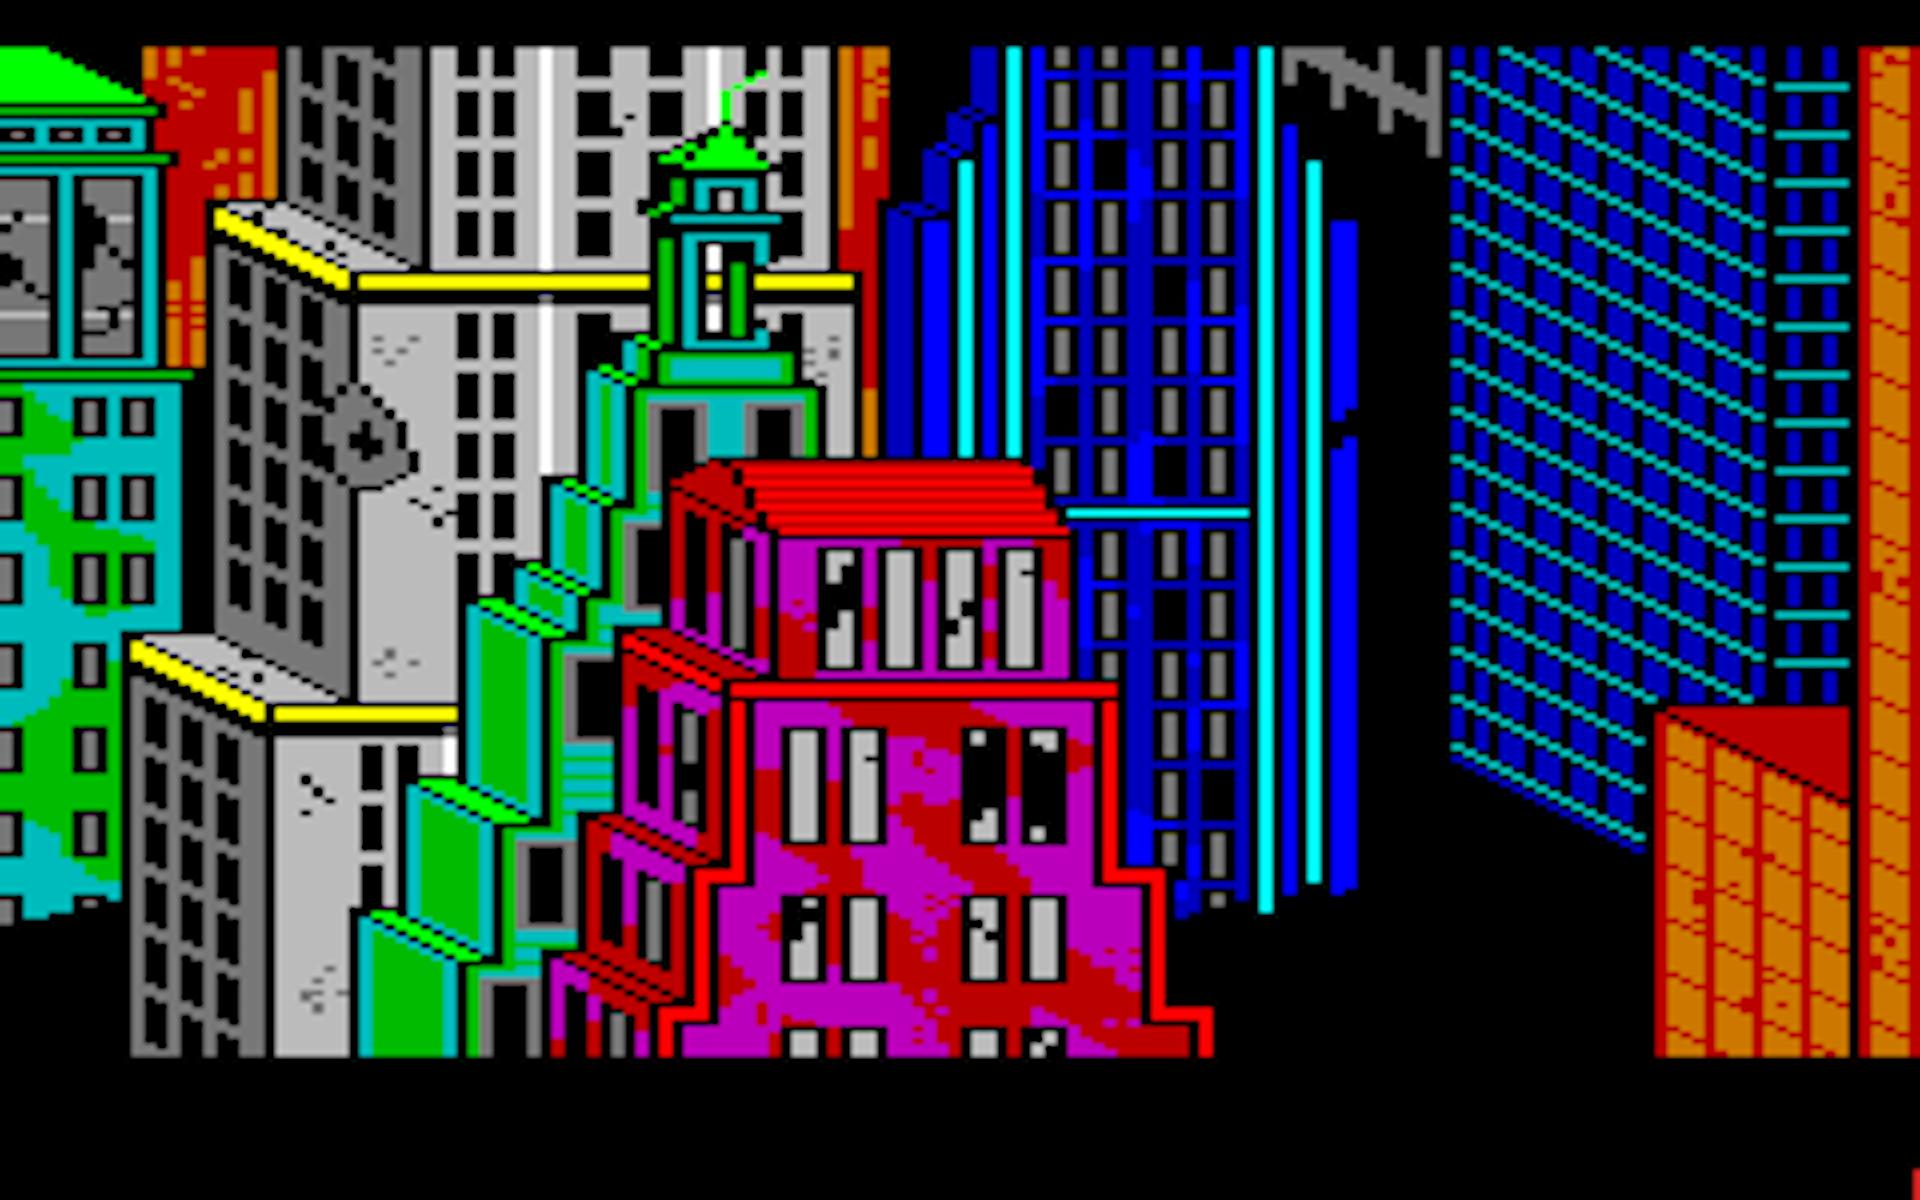 335246-manhunter-new-york-amiga-screenshot-intro-new-york-looks-a